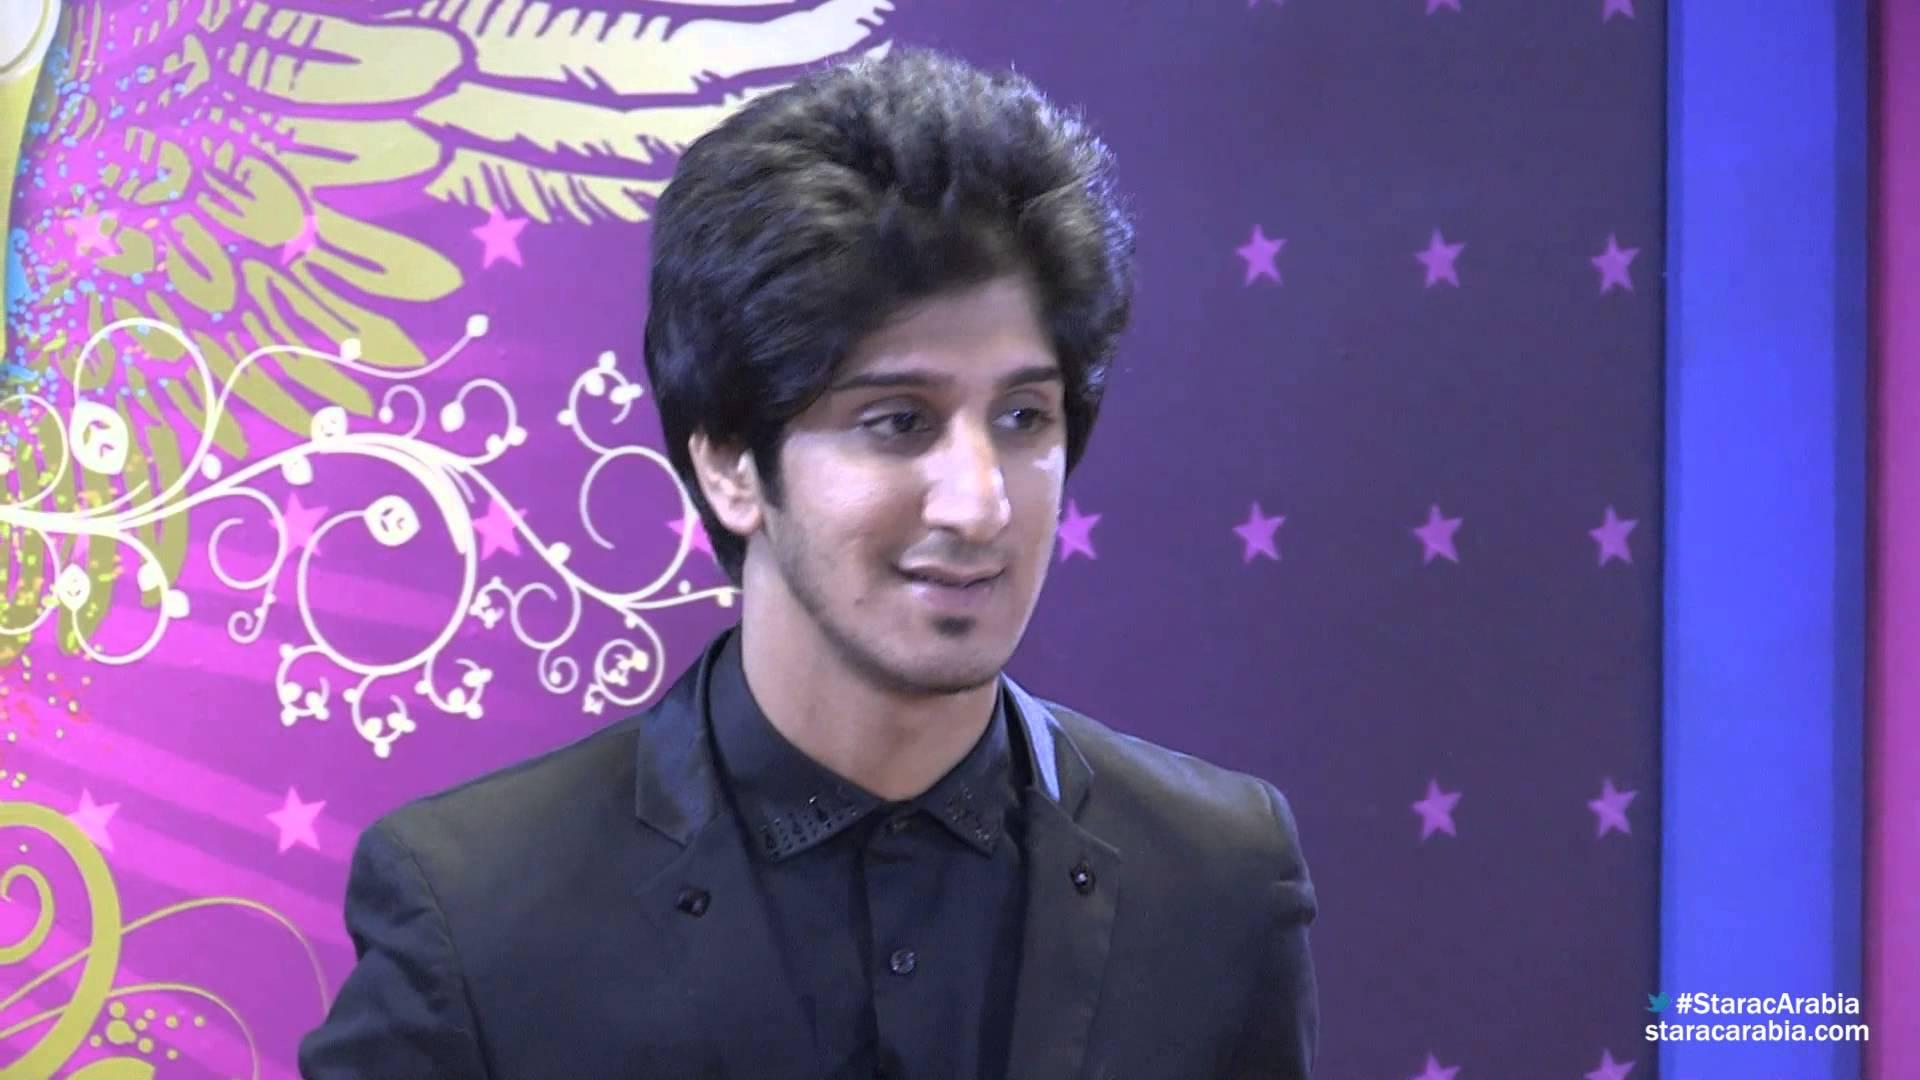 ��� ��� ���� ��� ������ Abdallah Abd Al Aziz 2014